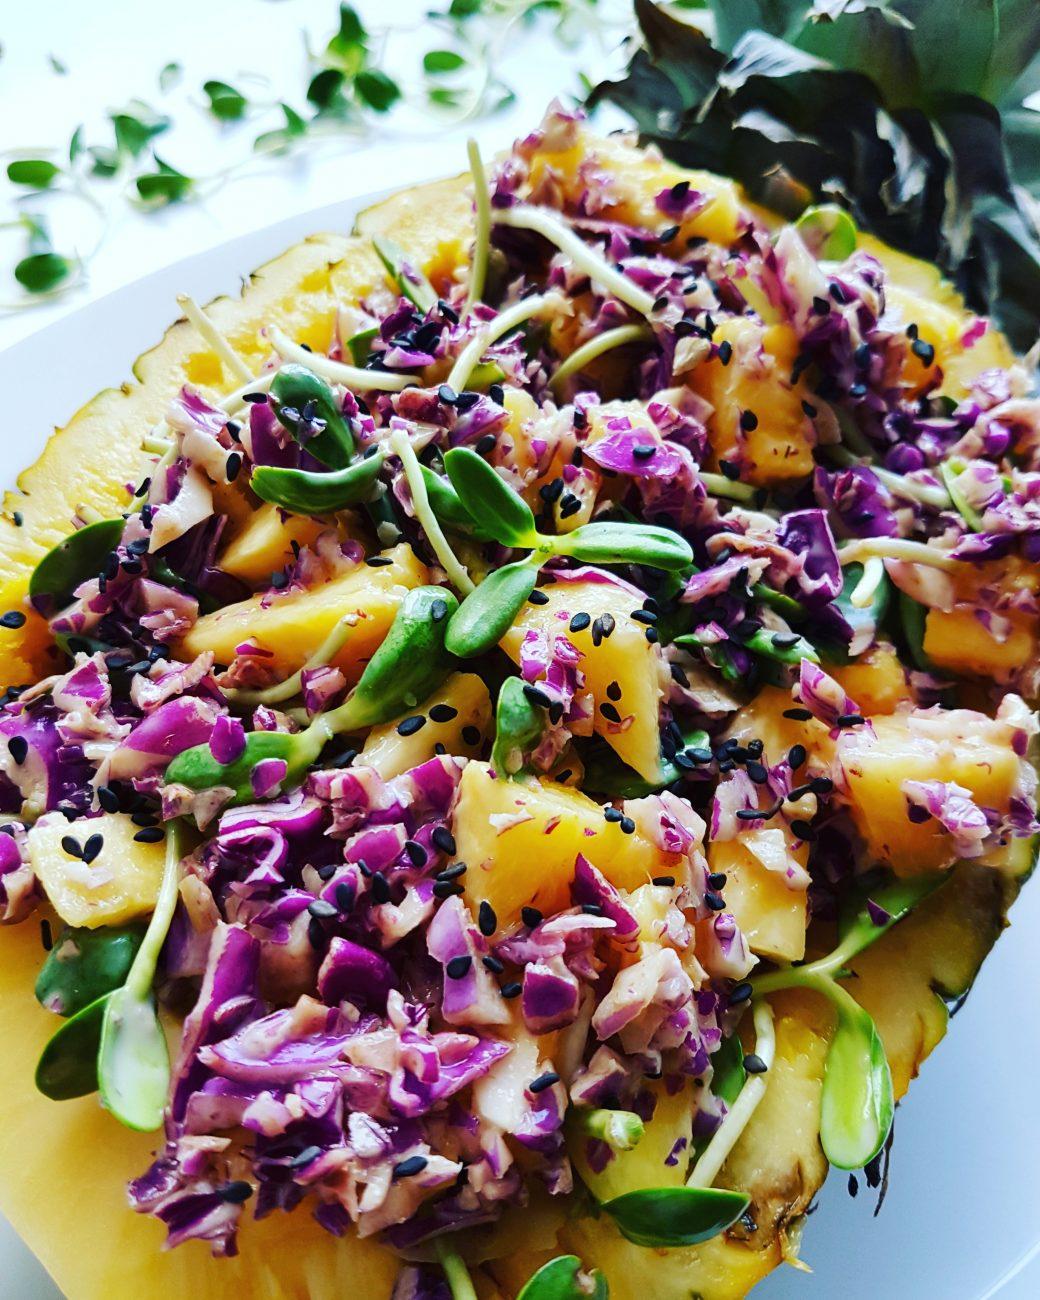 Salade sucrée-salée exotique: ananas, pousses, etcetera!